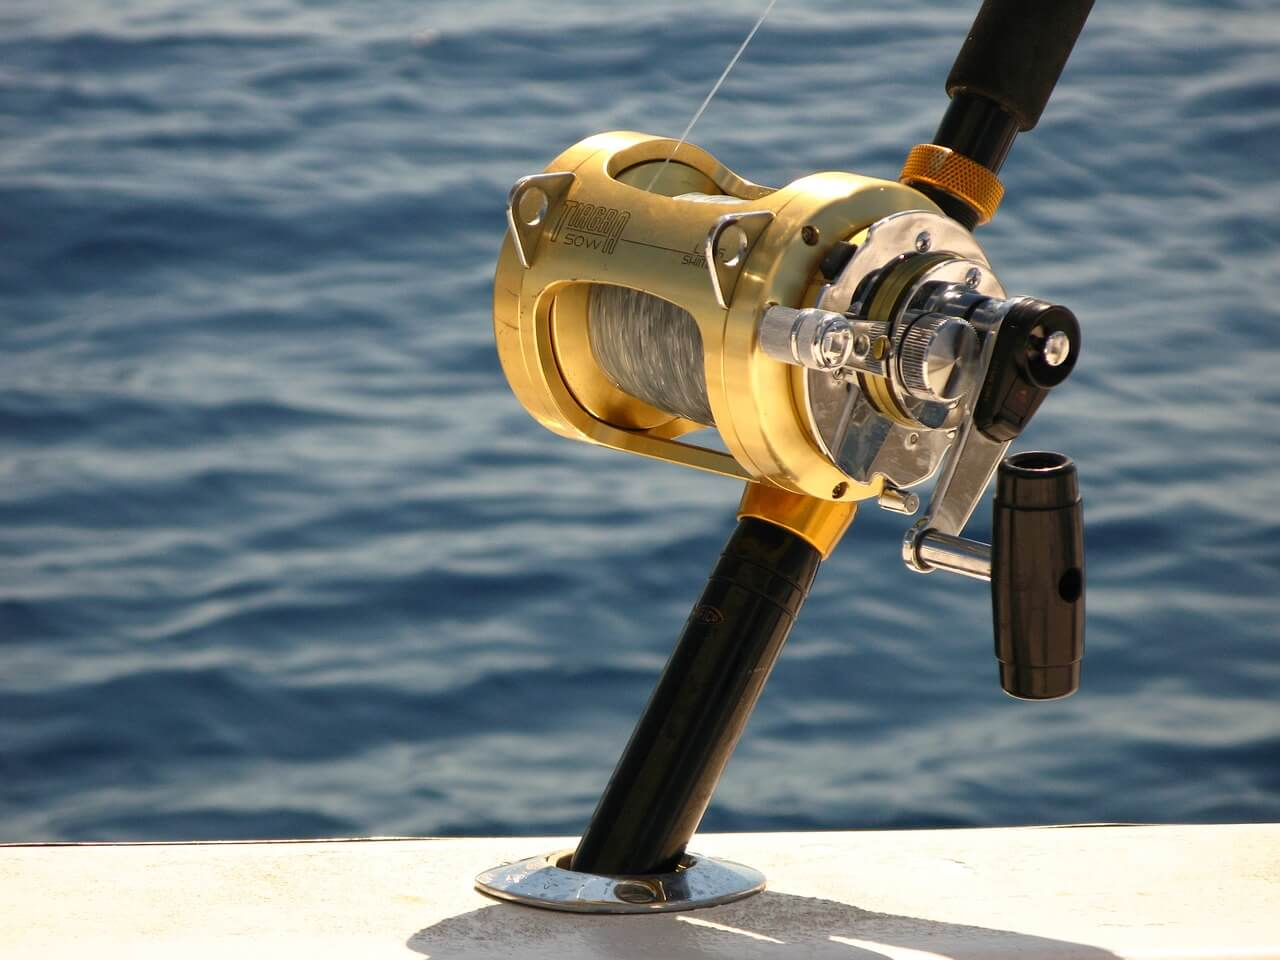 DEEP SEA FISHING REELS